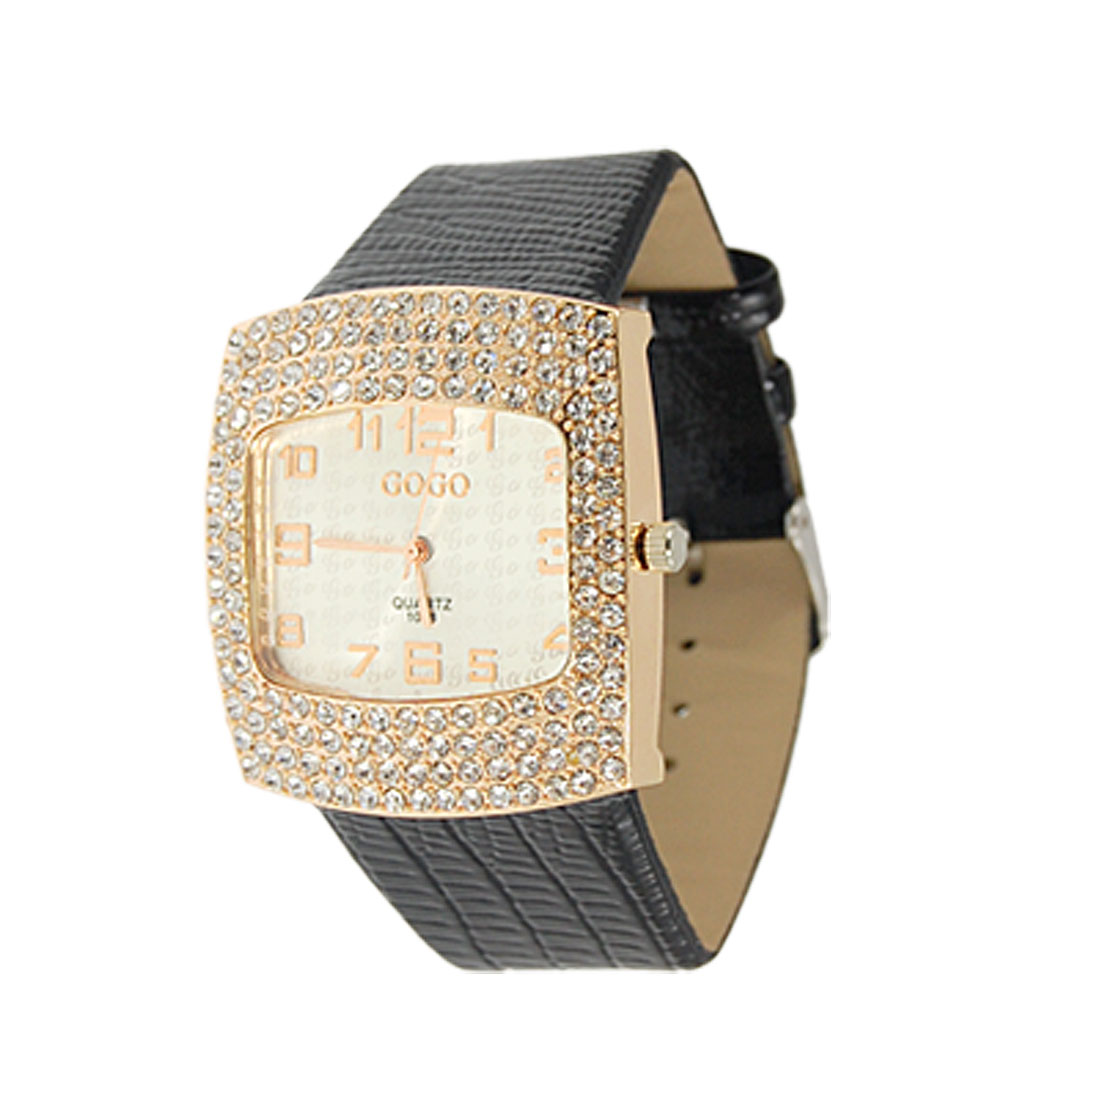 Lady Crocodile Print Faux Leather Band Rhinestone Decor Case Wristwatch Black